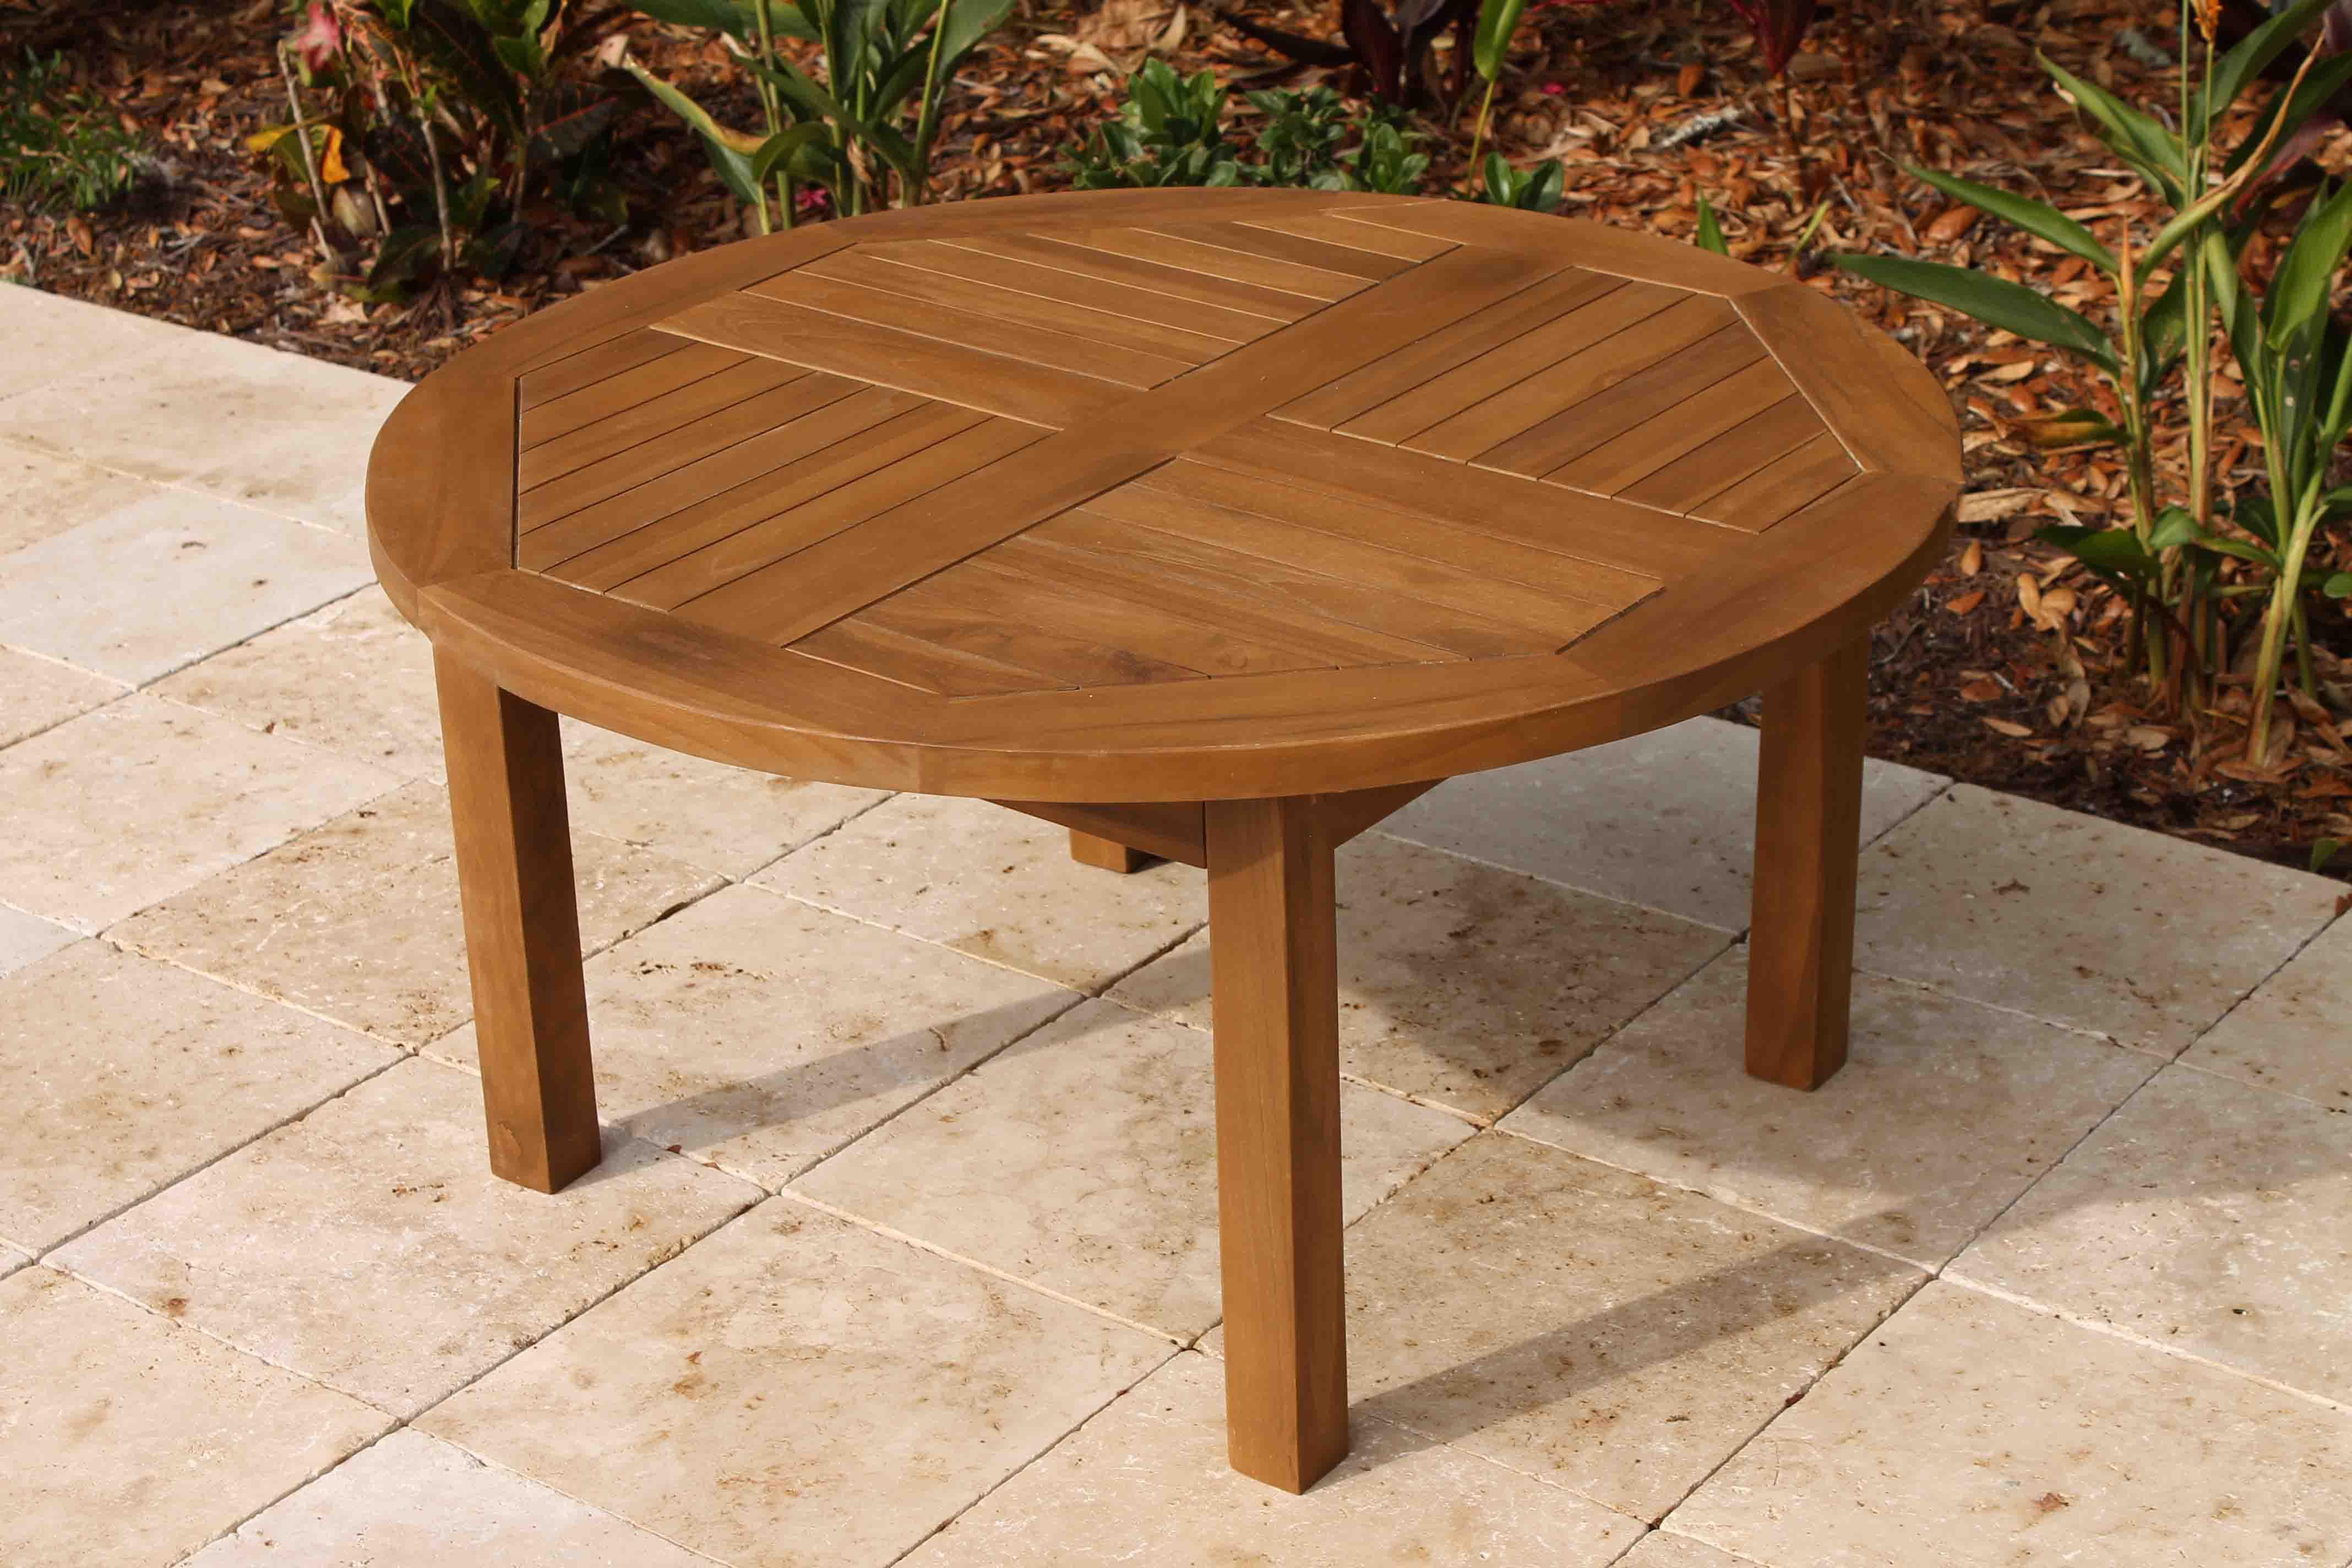 Sale Teak Round Side Table 36in Oceanic Teak Furniture